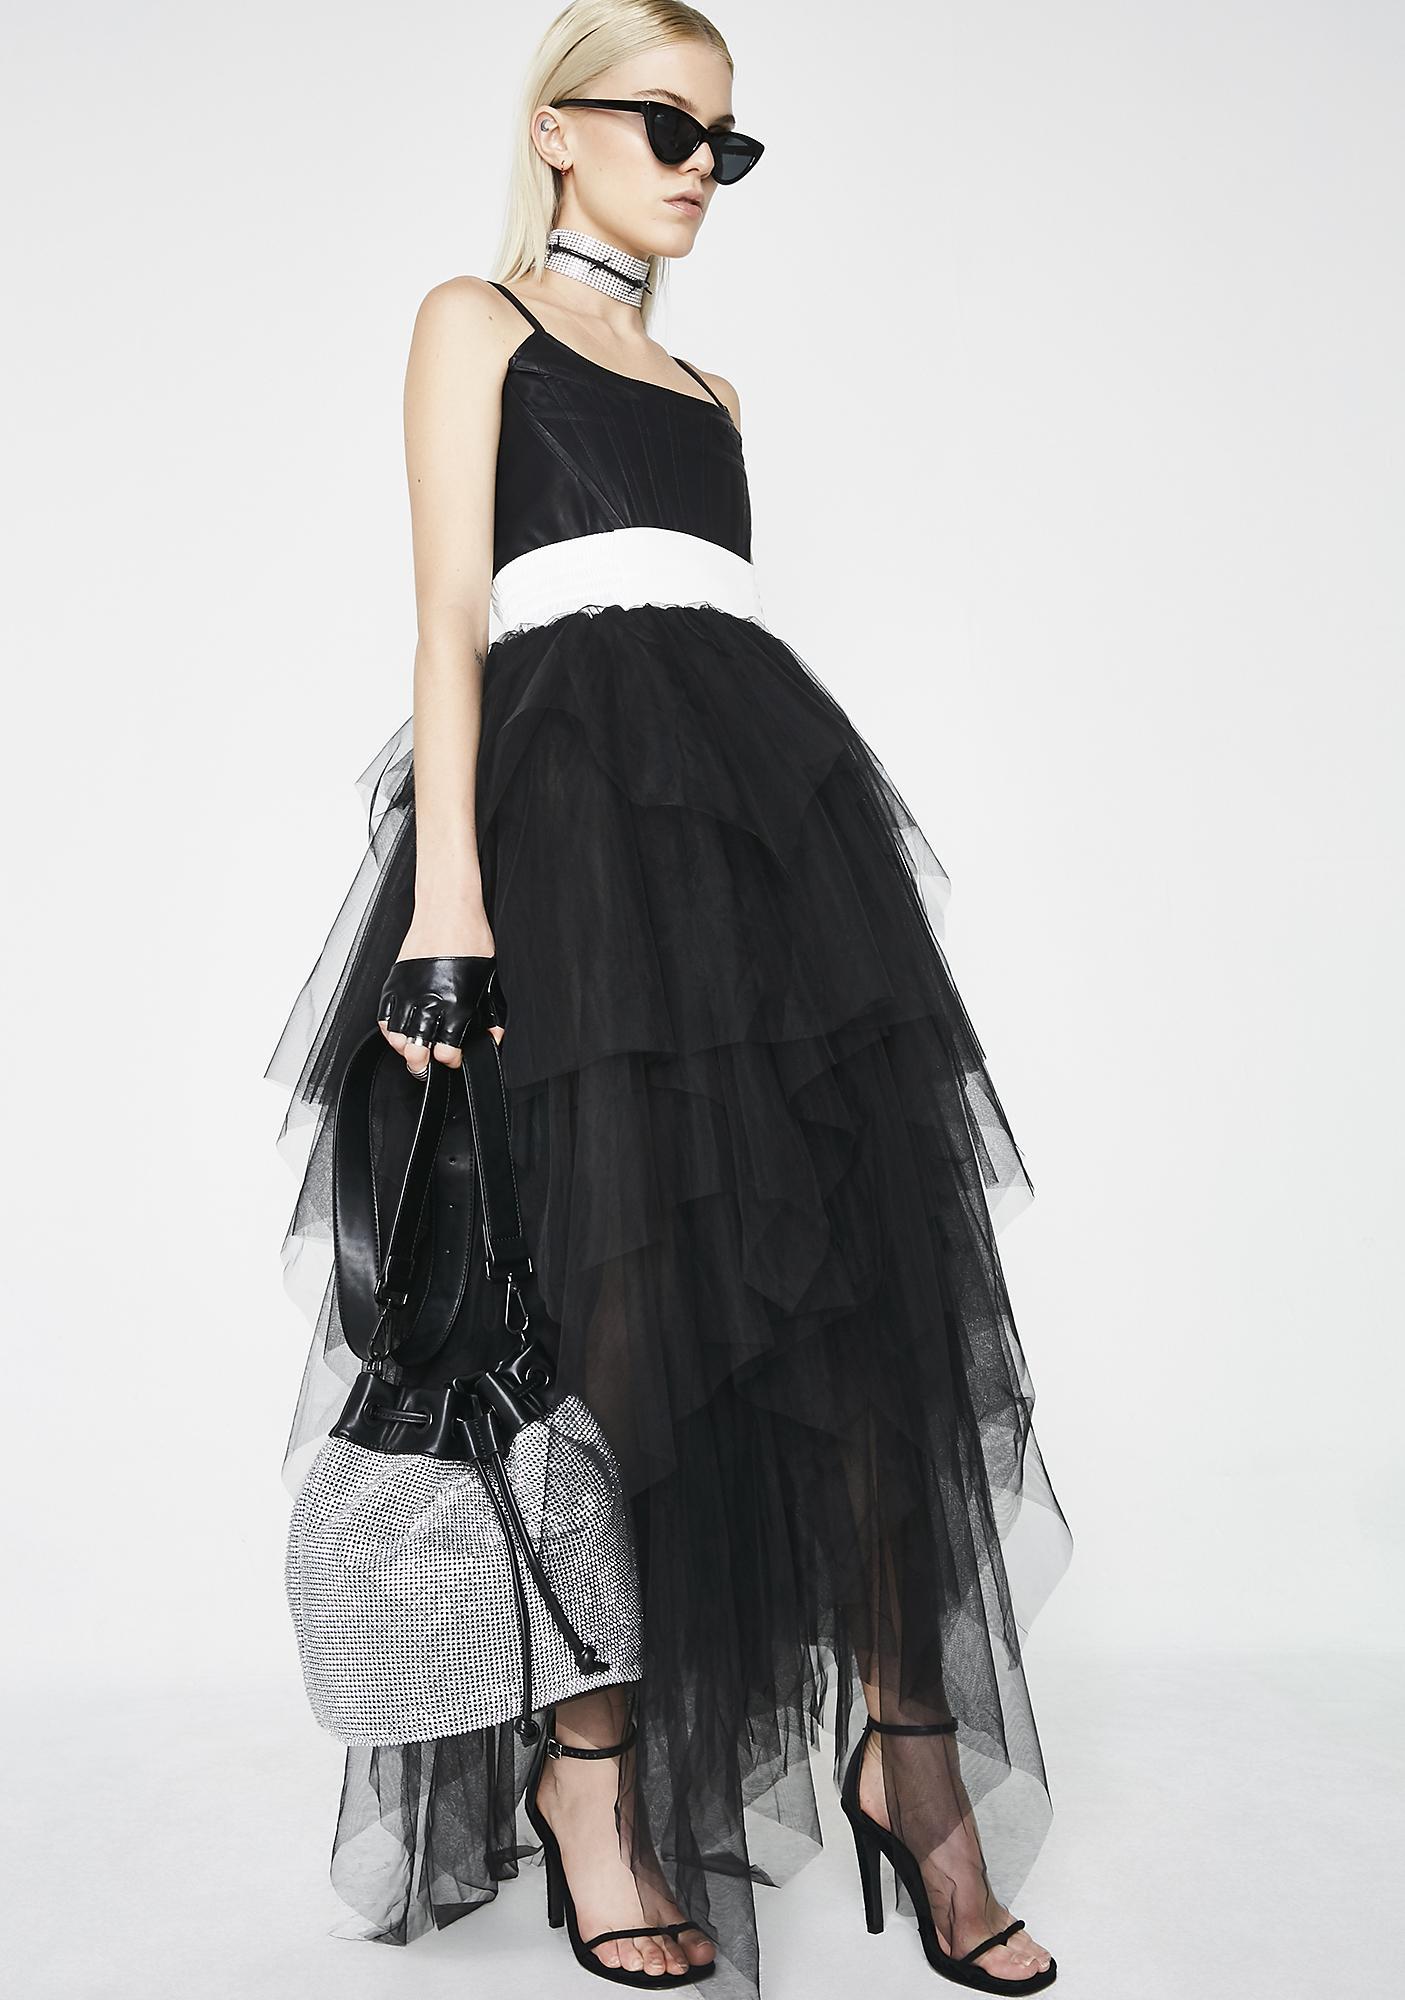 Kiki Riki Dark Fantasies Layered Skirt